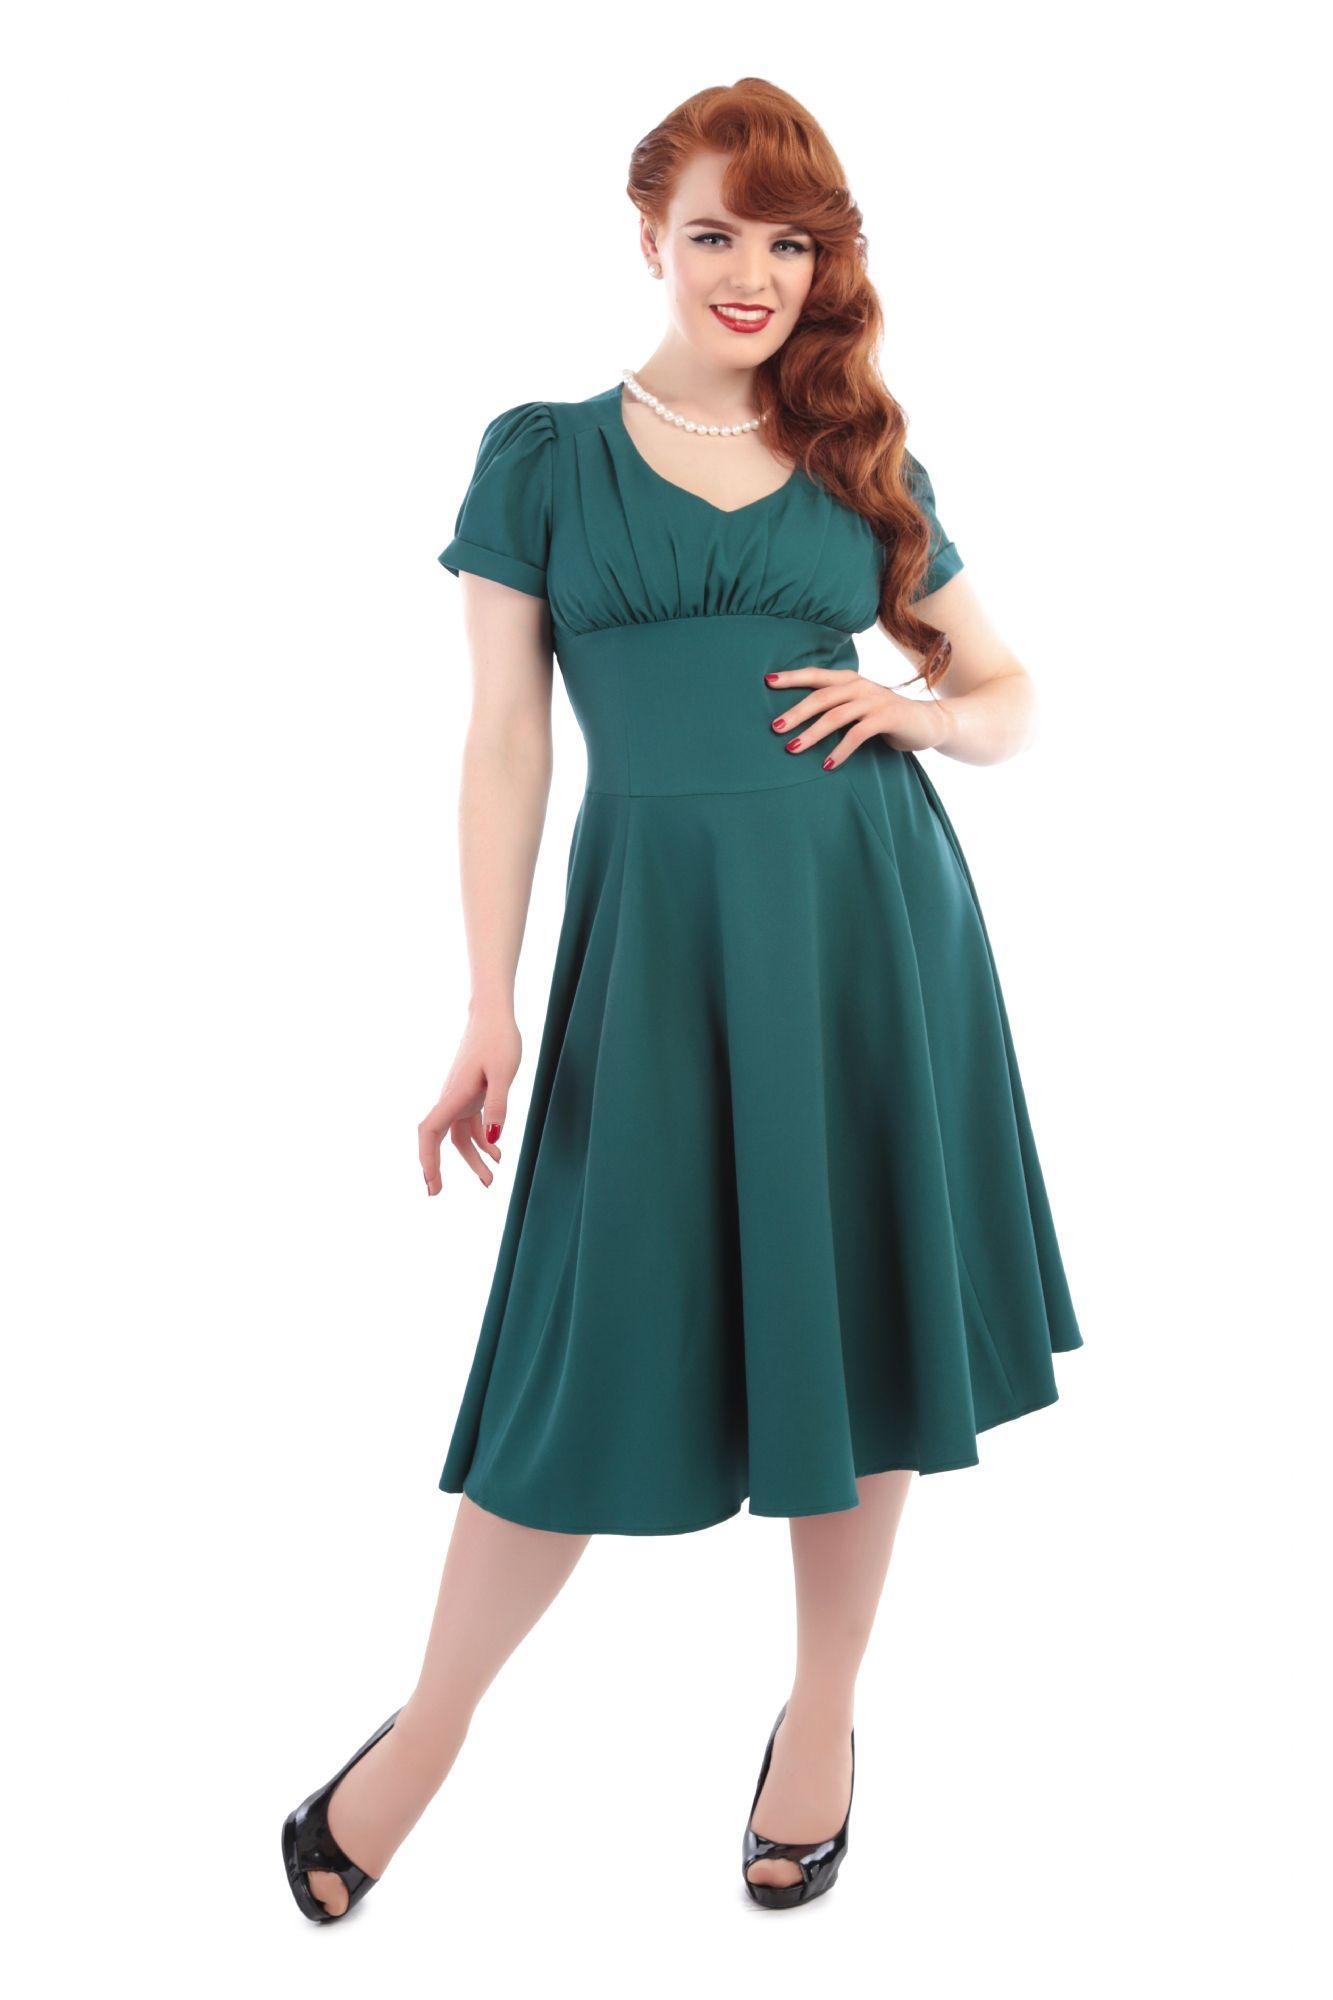 Nadine Plain Vintage Tea Dress 0 | Pin Up Fashion | Pinterest ...